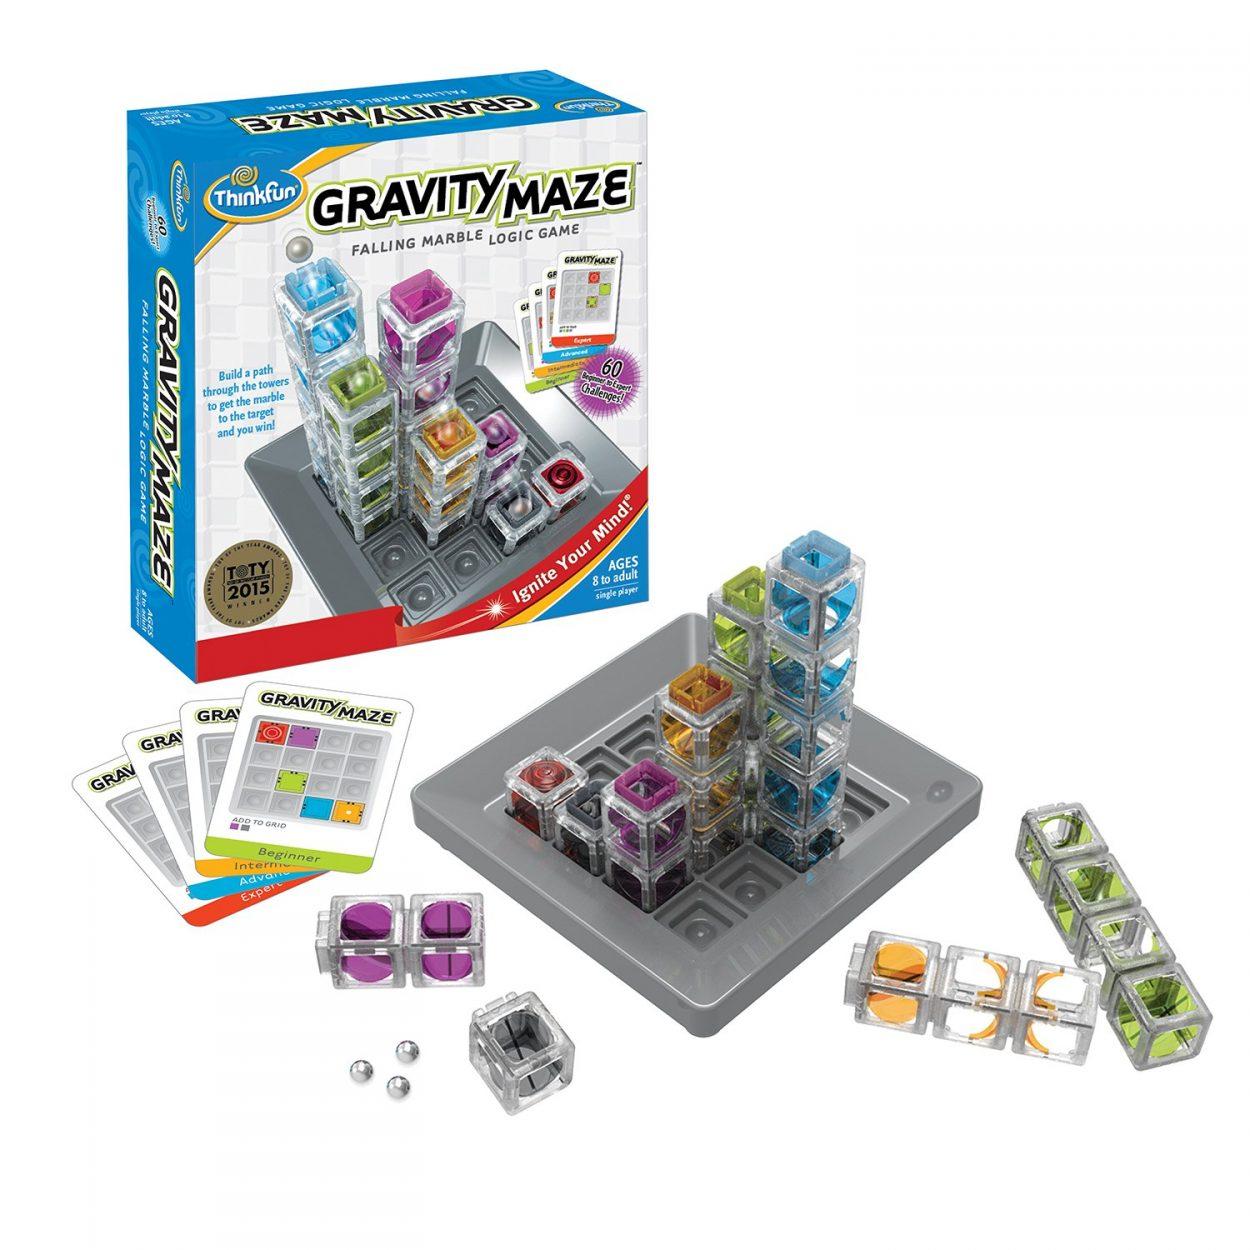 ThinkFun Gravity Maze Marble game